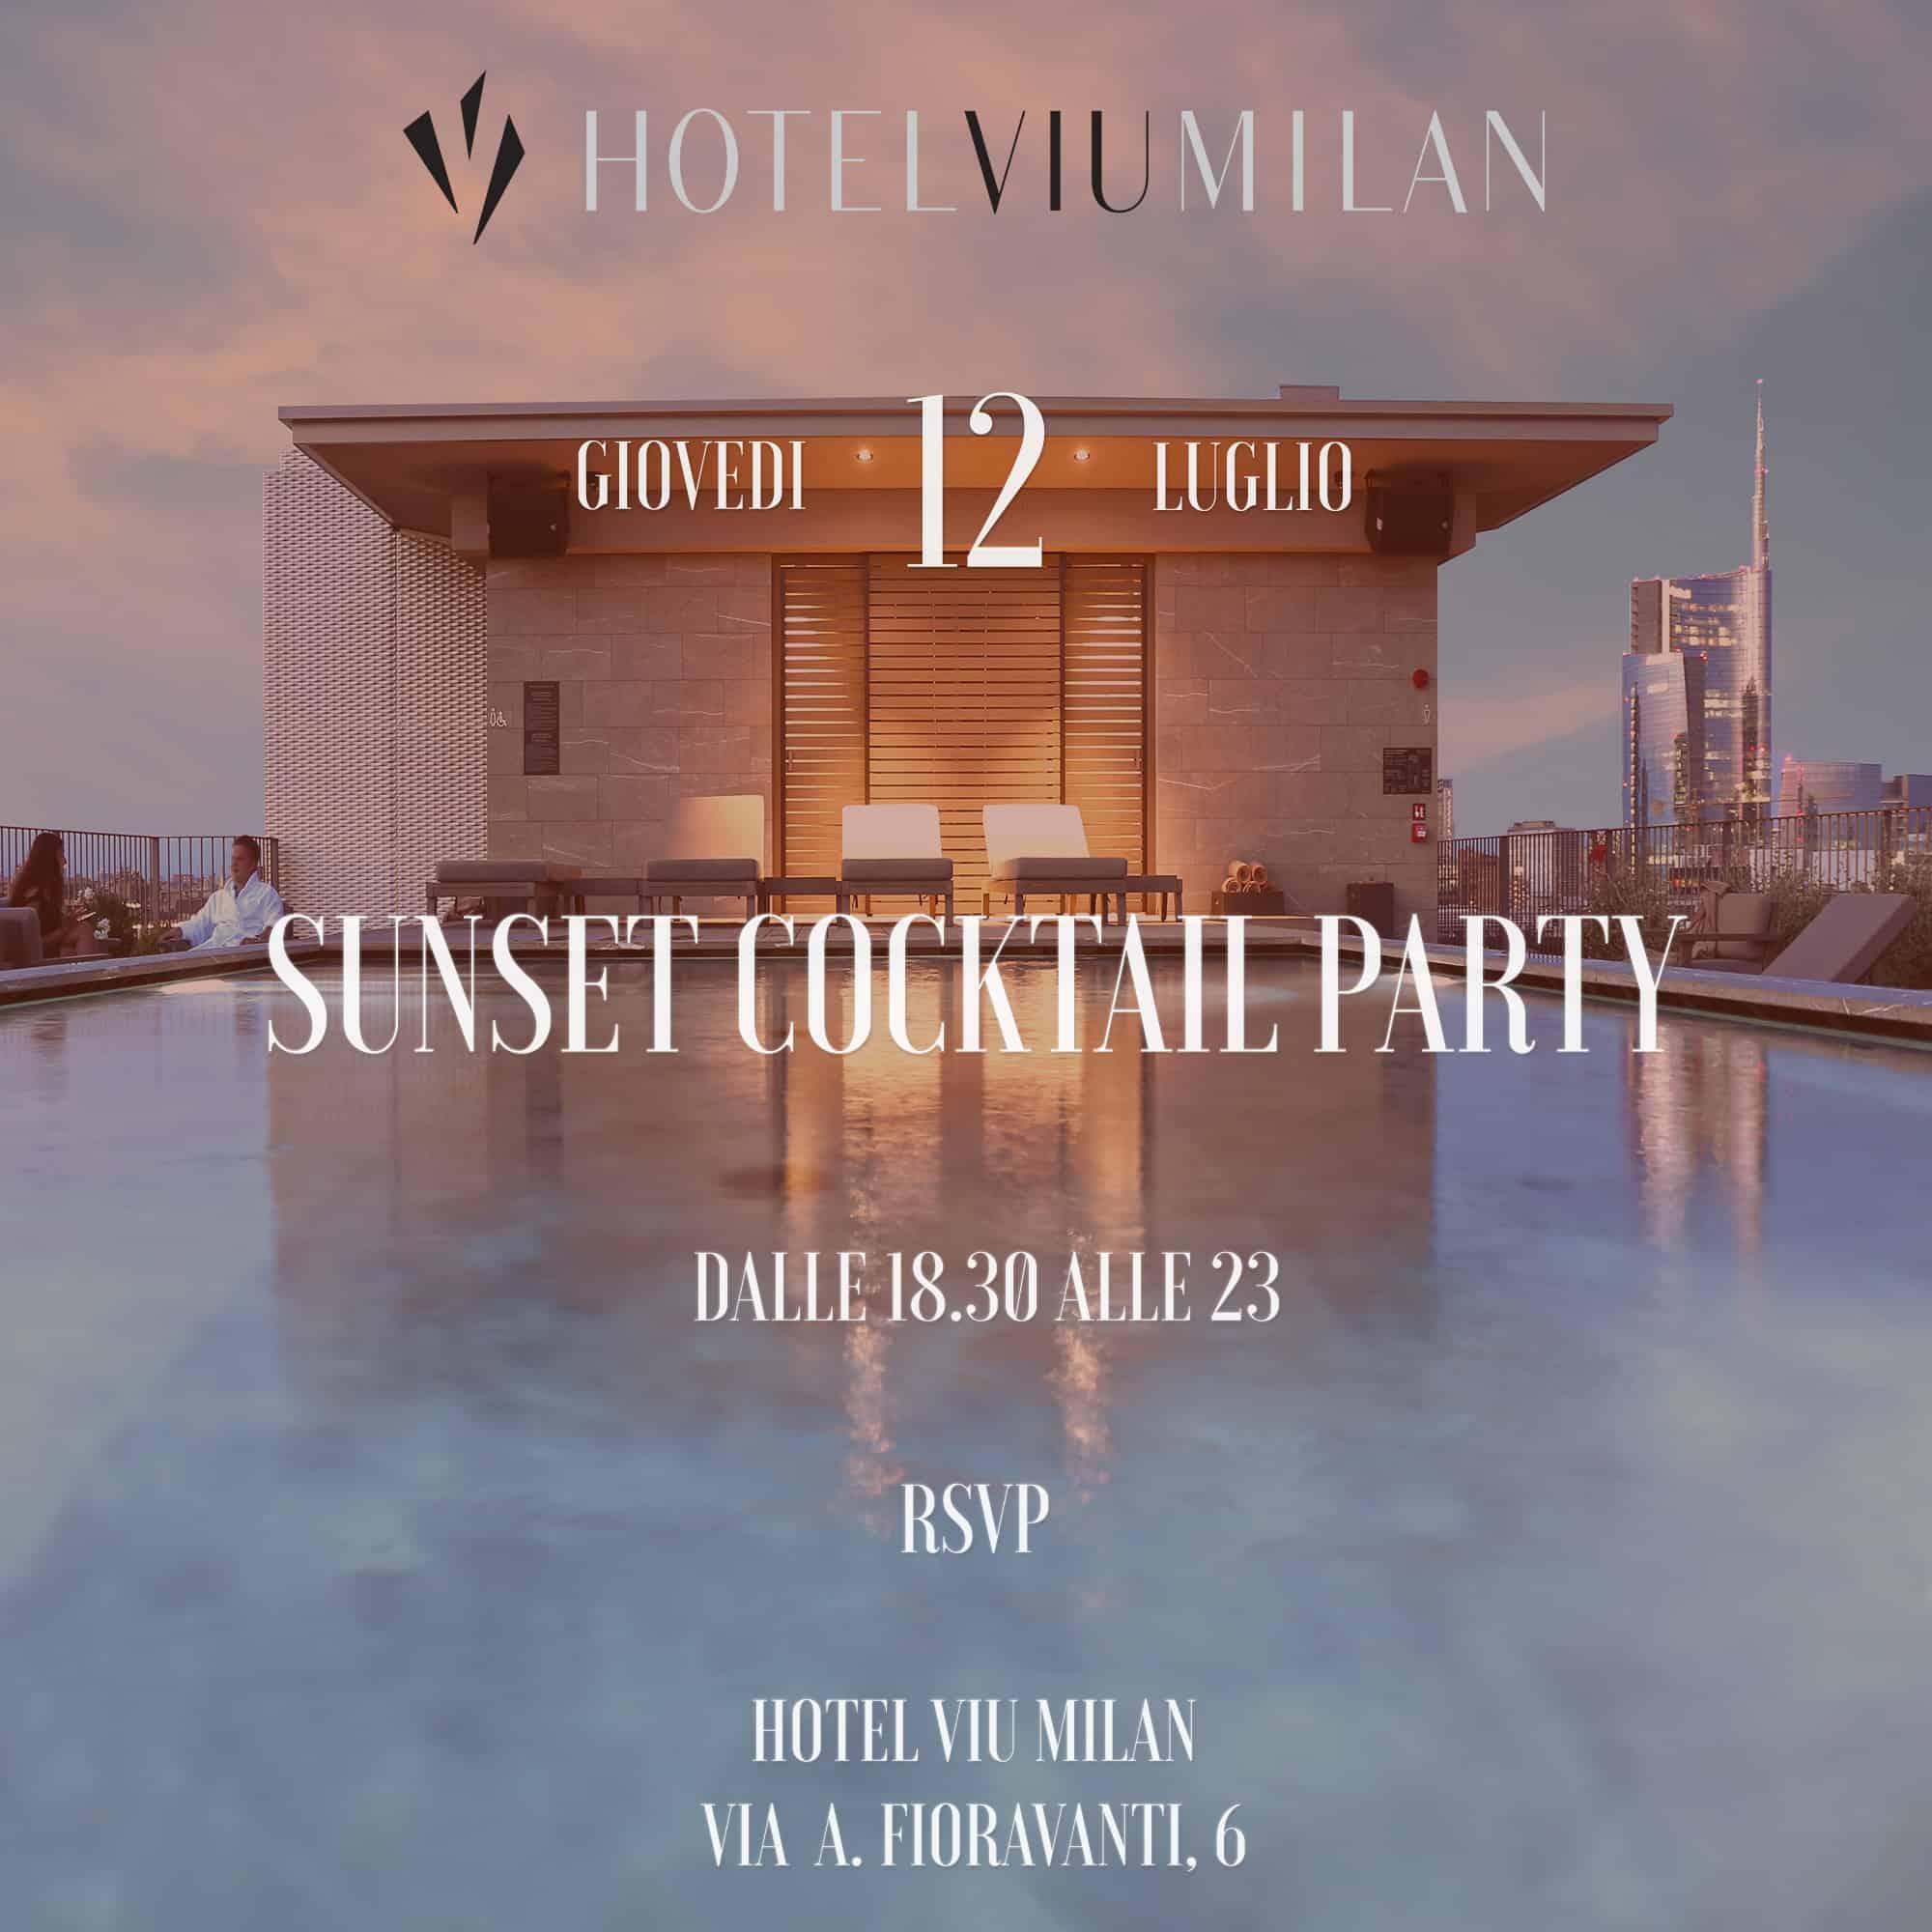 Hotel Viu - Sunset Cocktil Party